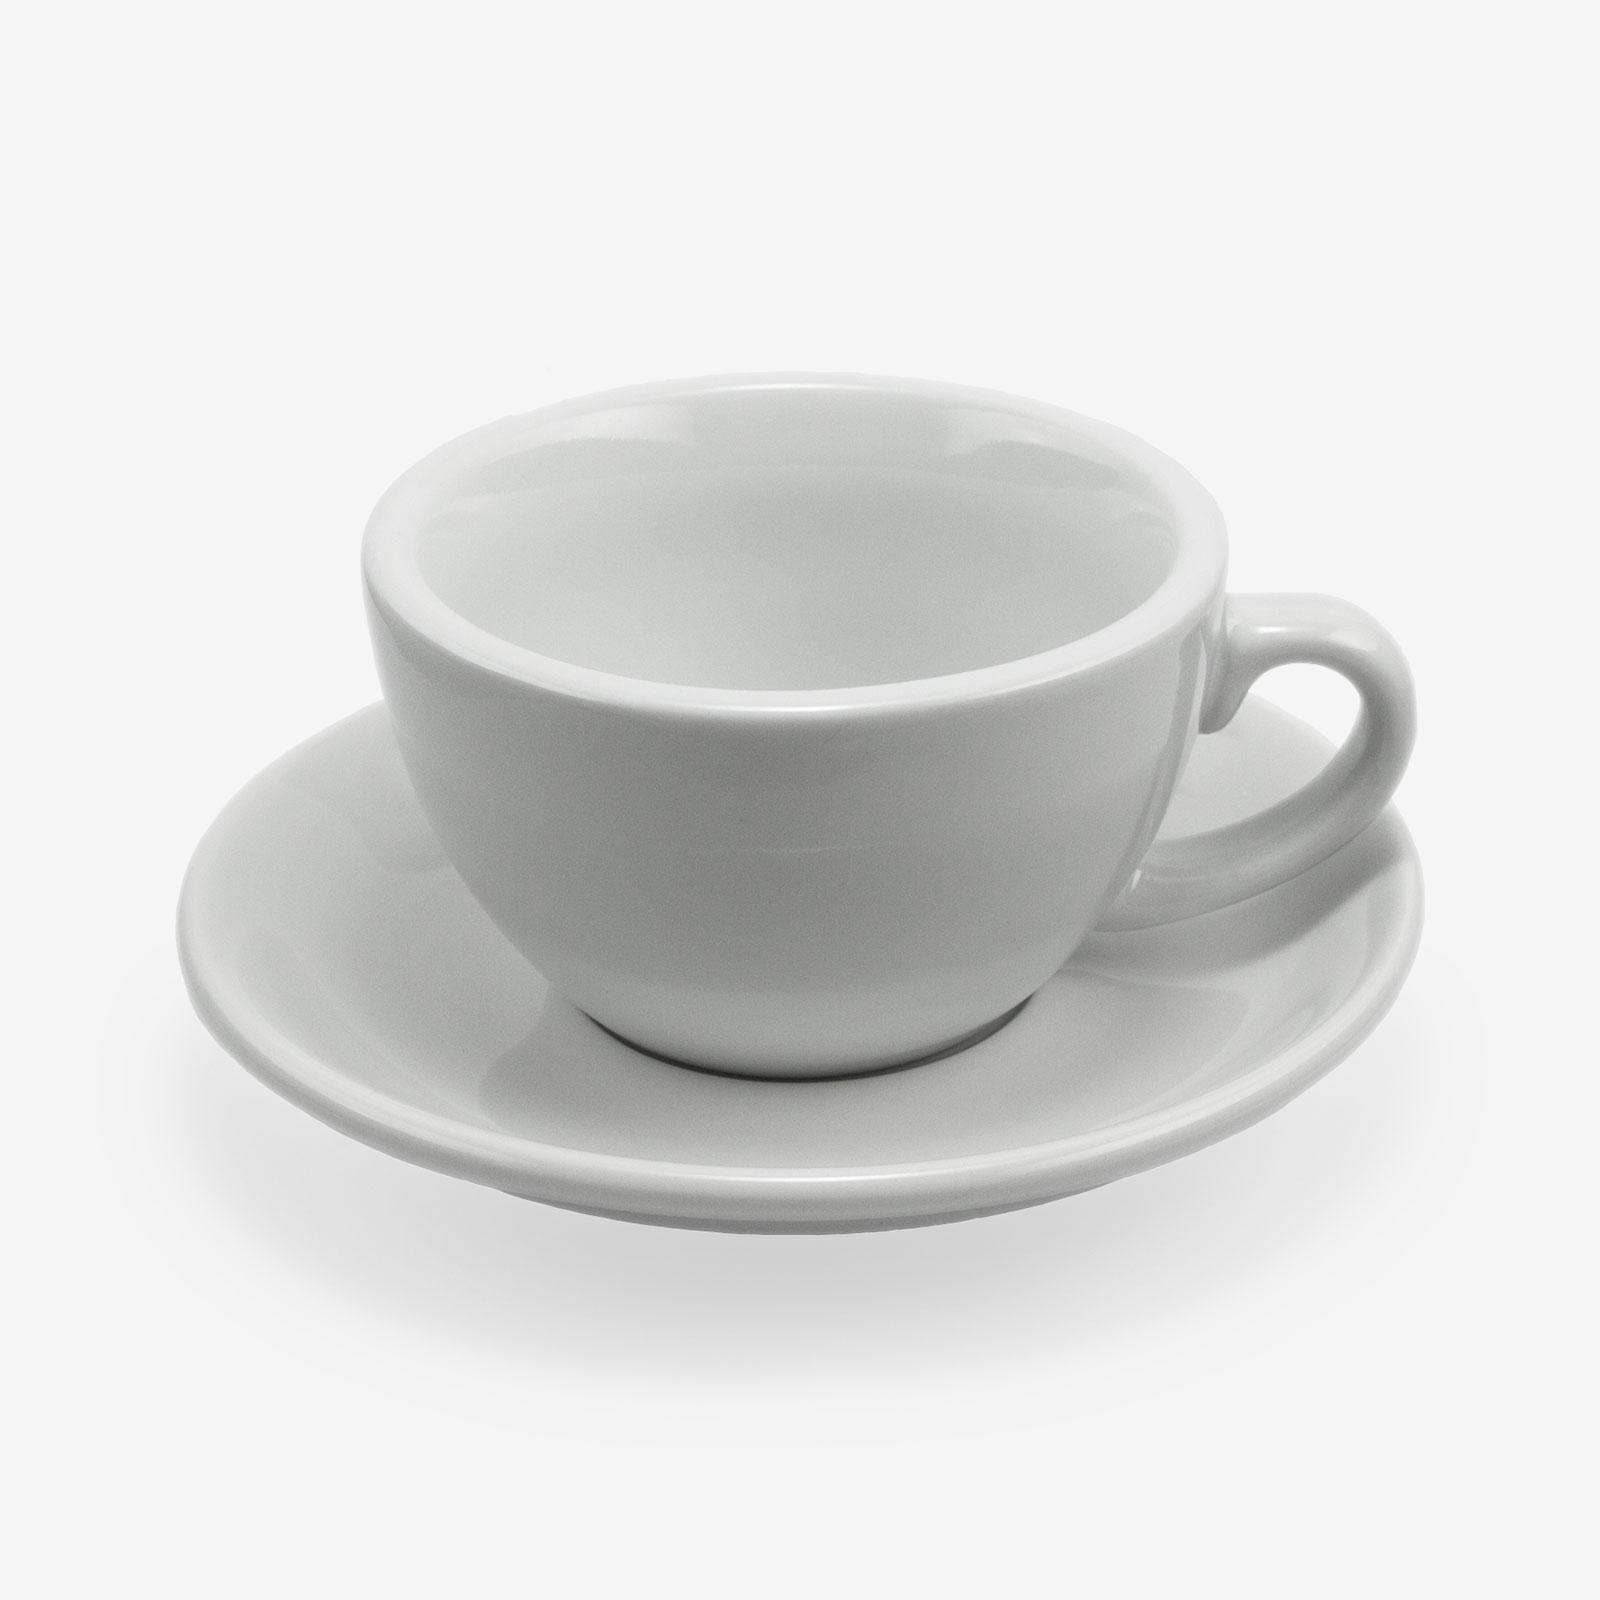 acme cappuccino cups  blixt coffee - acme cappuccino cups